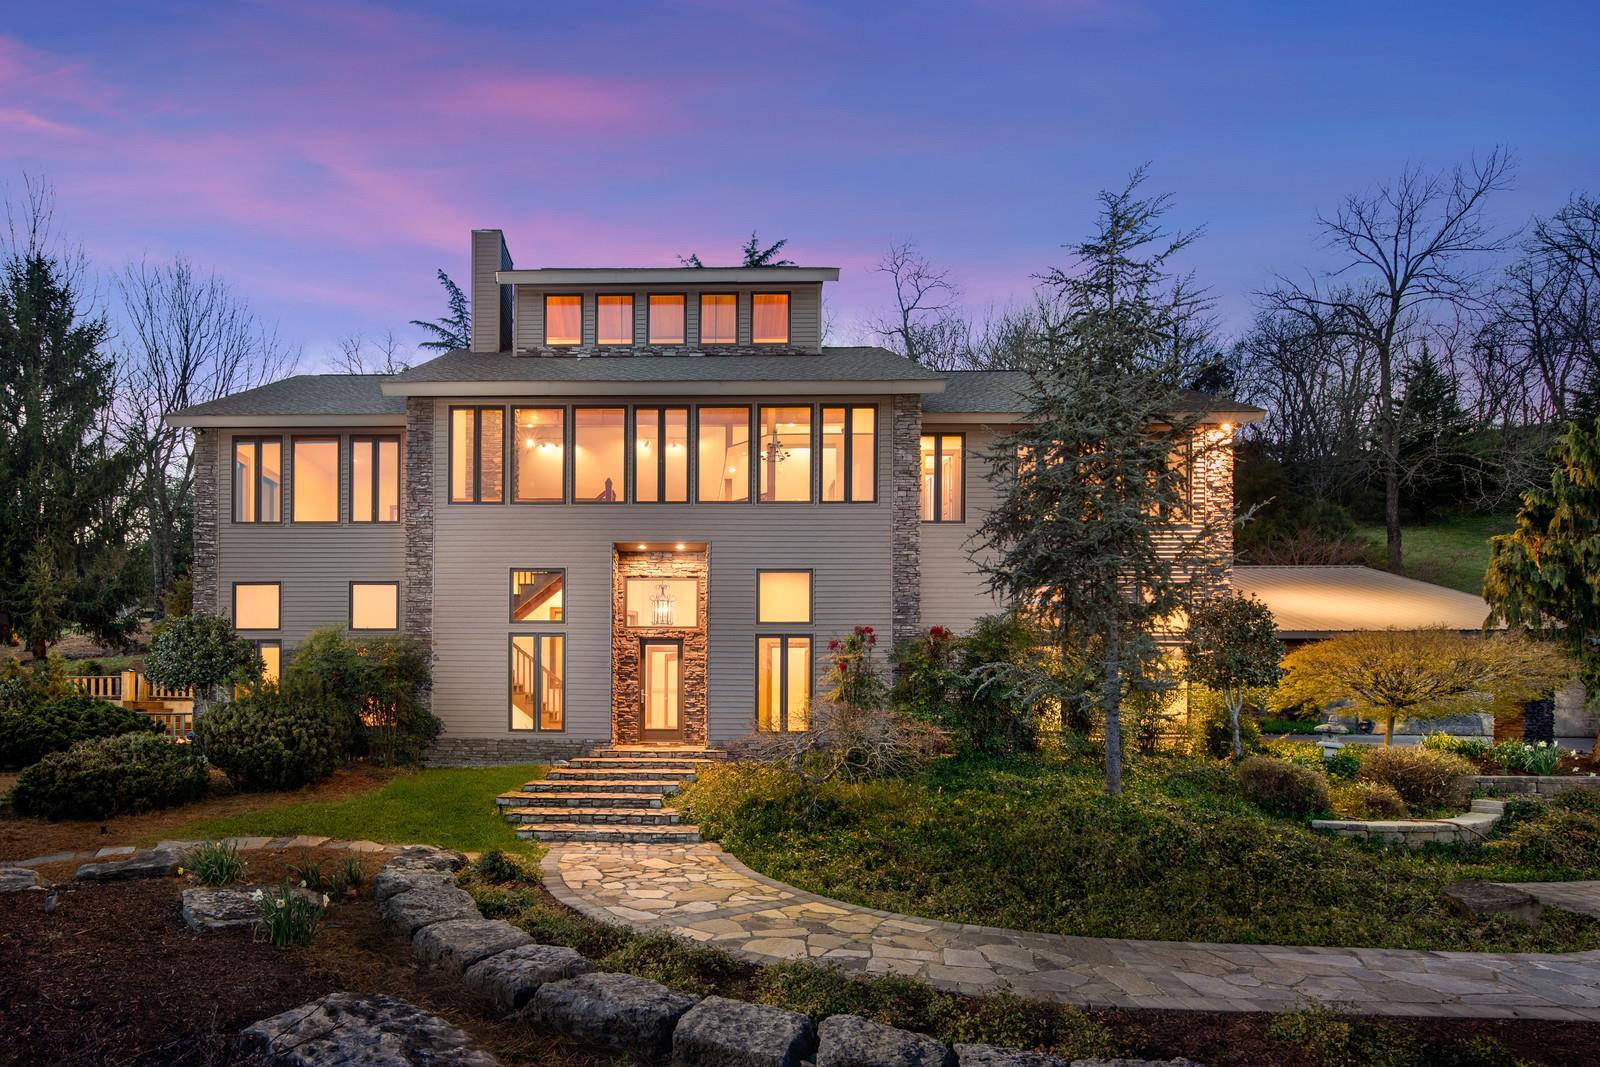 3631 E McEwen Dr, Franklin, TN 37064 - Franklin, TN real estate listing